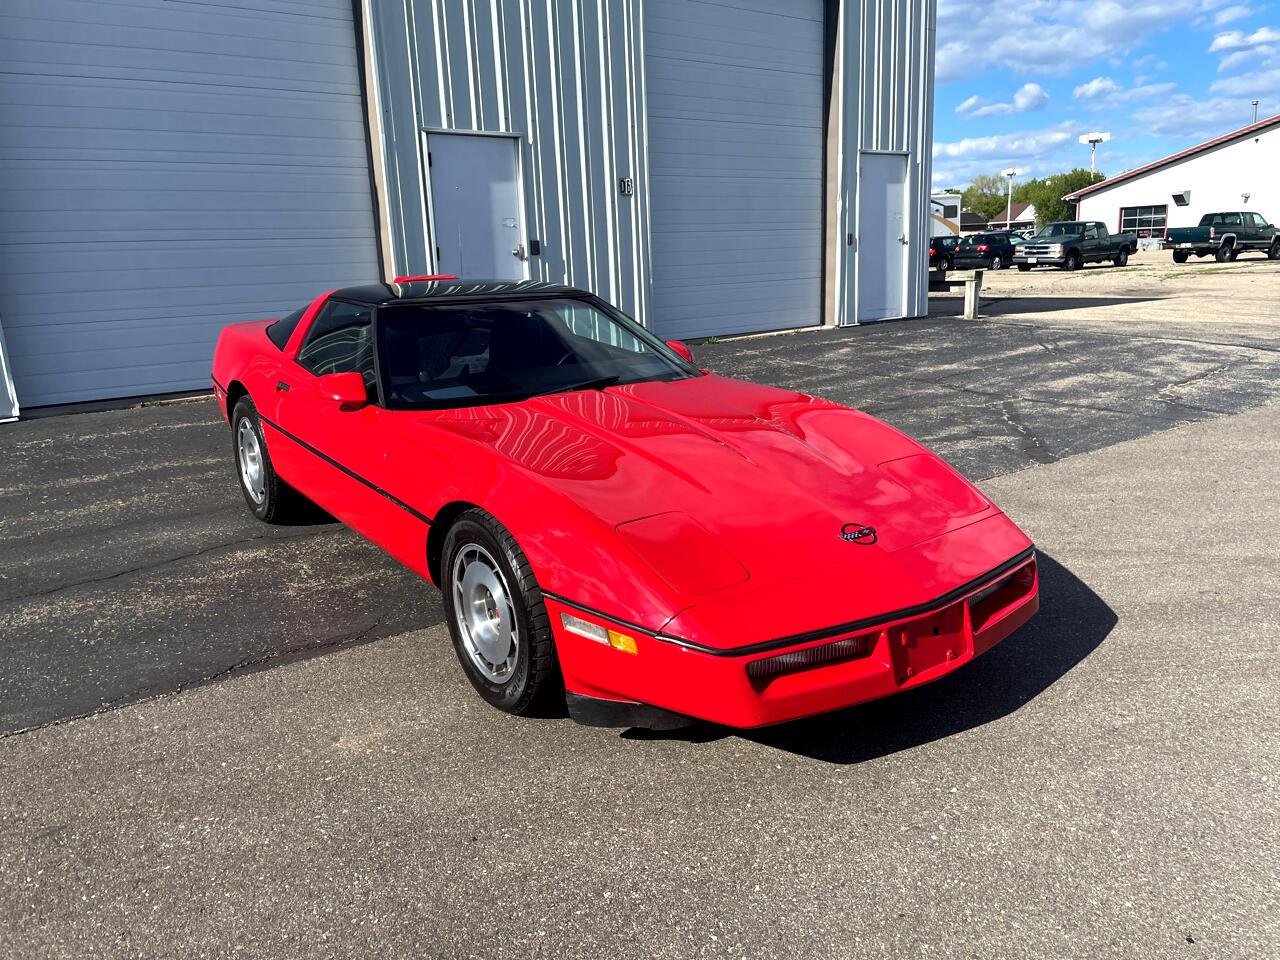 Chevrolet Corvette 2dr Hatchback Coupe 1986